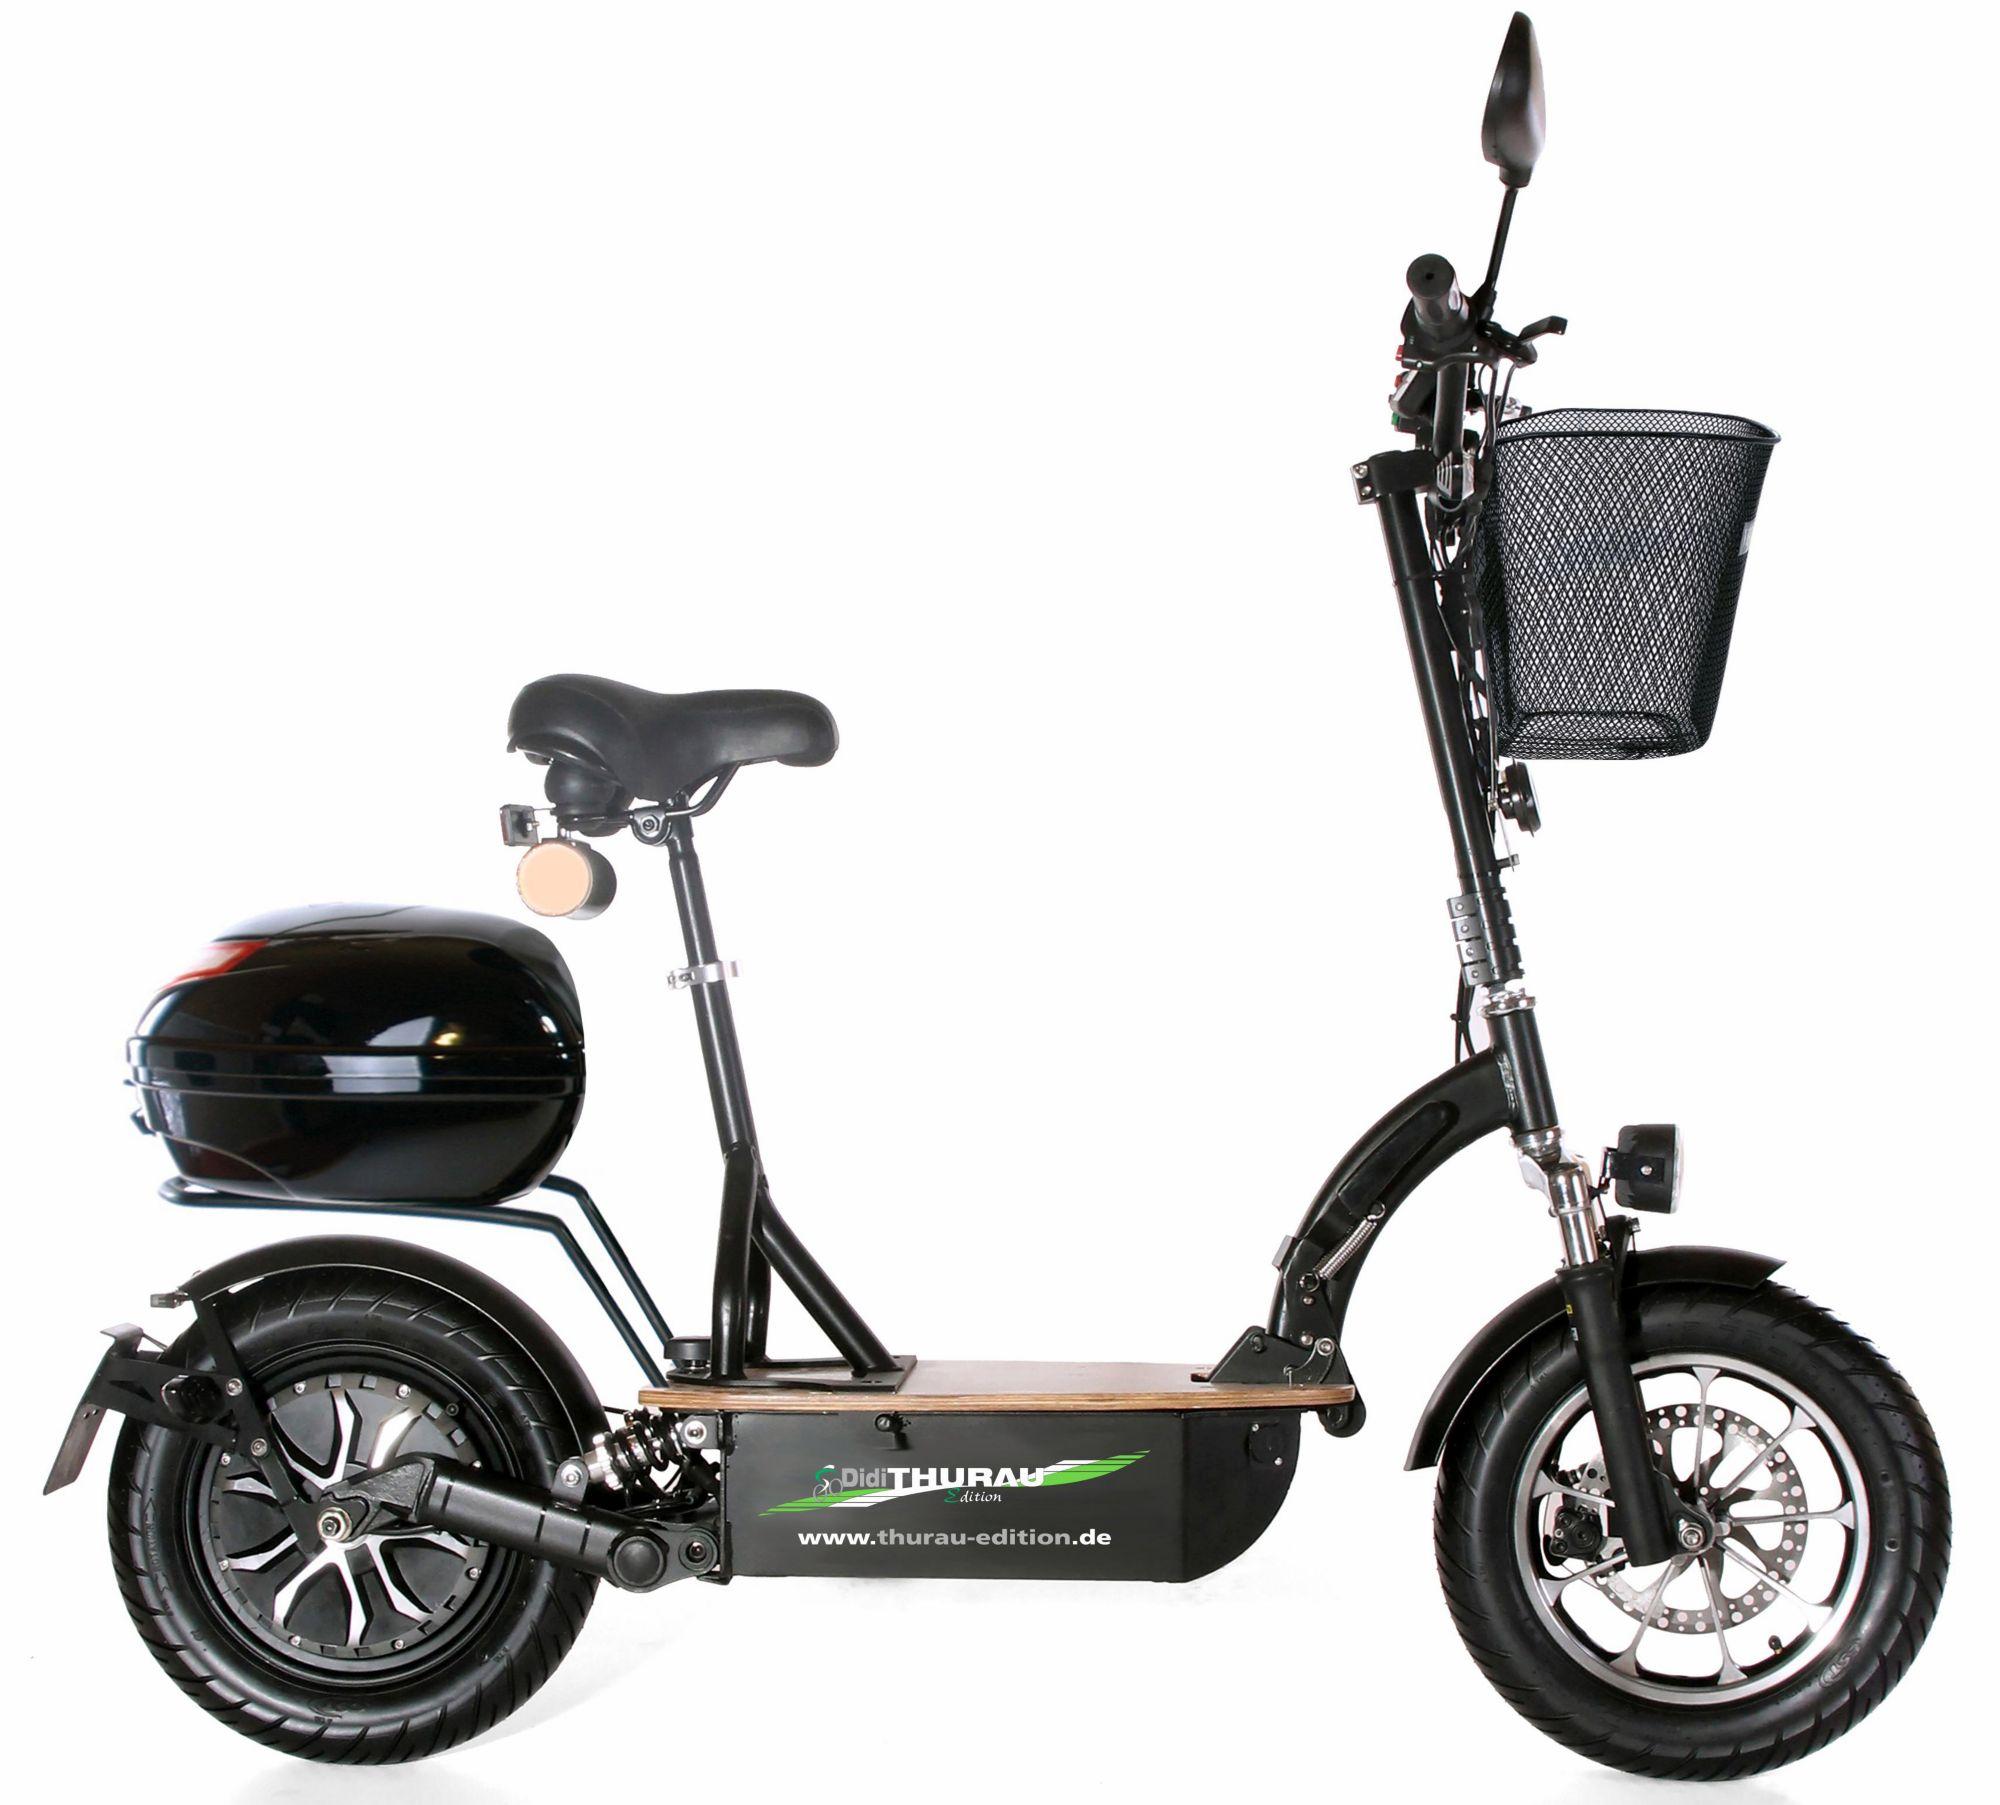 DIDI THURAU EDITION Didi Thurau Edition Elektro-Roller Eco-Tourer Speed, 45 km/h, »Safety«